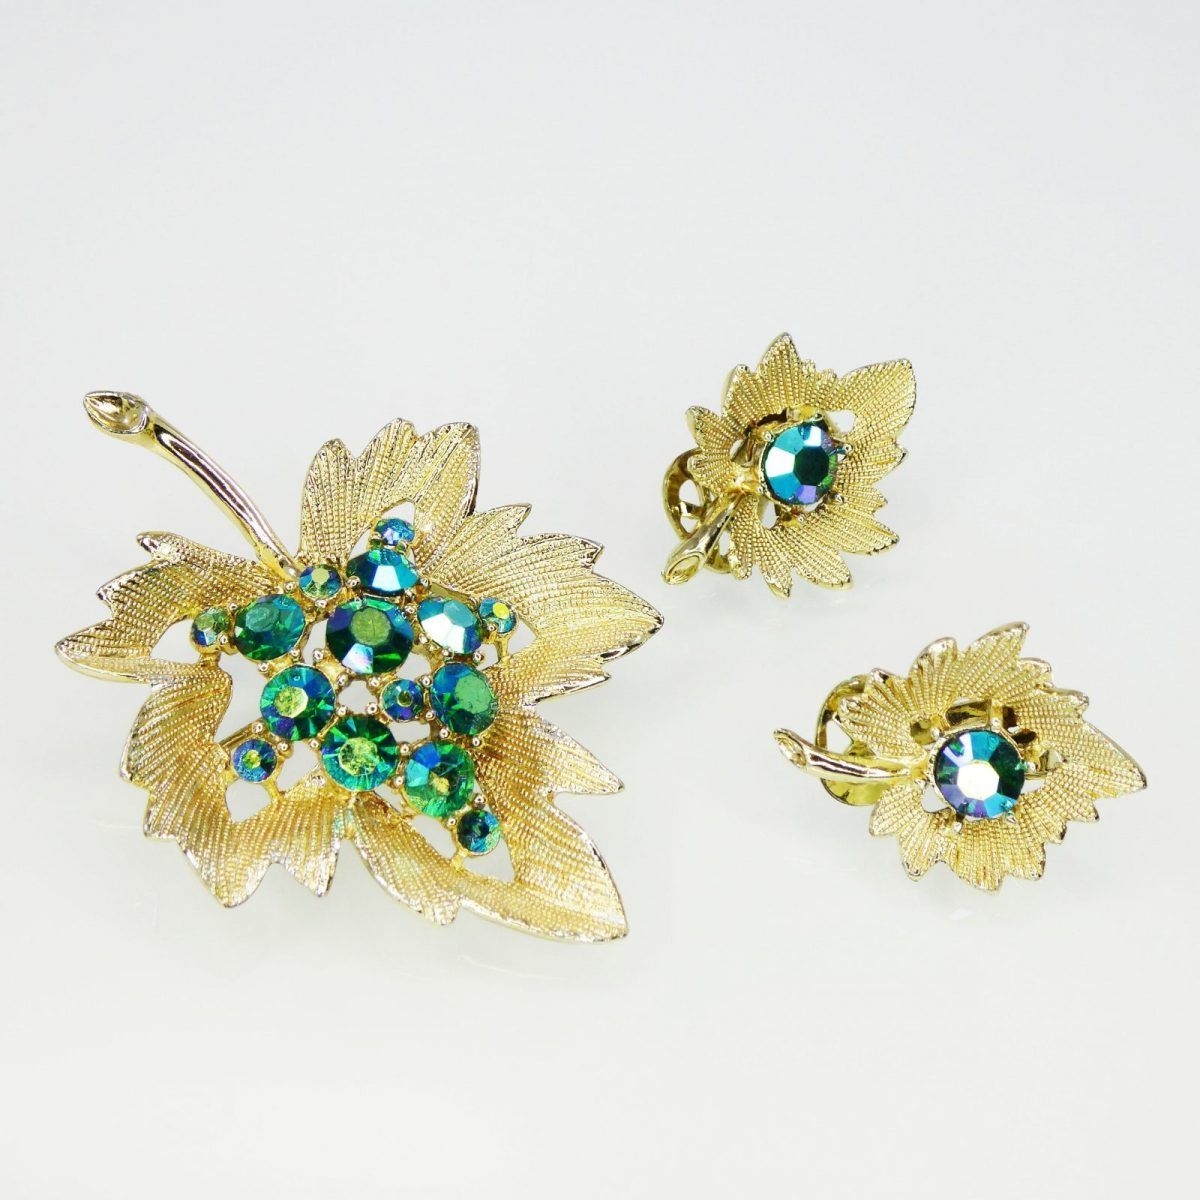 Rhinestone Leaf Brooch and Earrings Set, Green Aurora Borealis Rhinestones, Clip On Earrings & Pin Demi Parure, Vintage 1950's, Demi Parure #vintagerhinestone